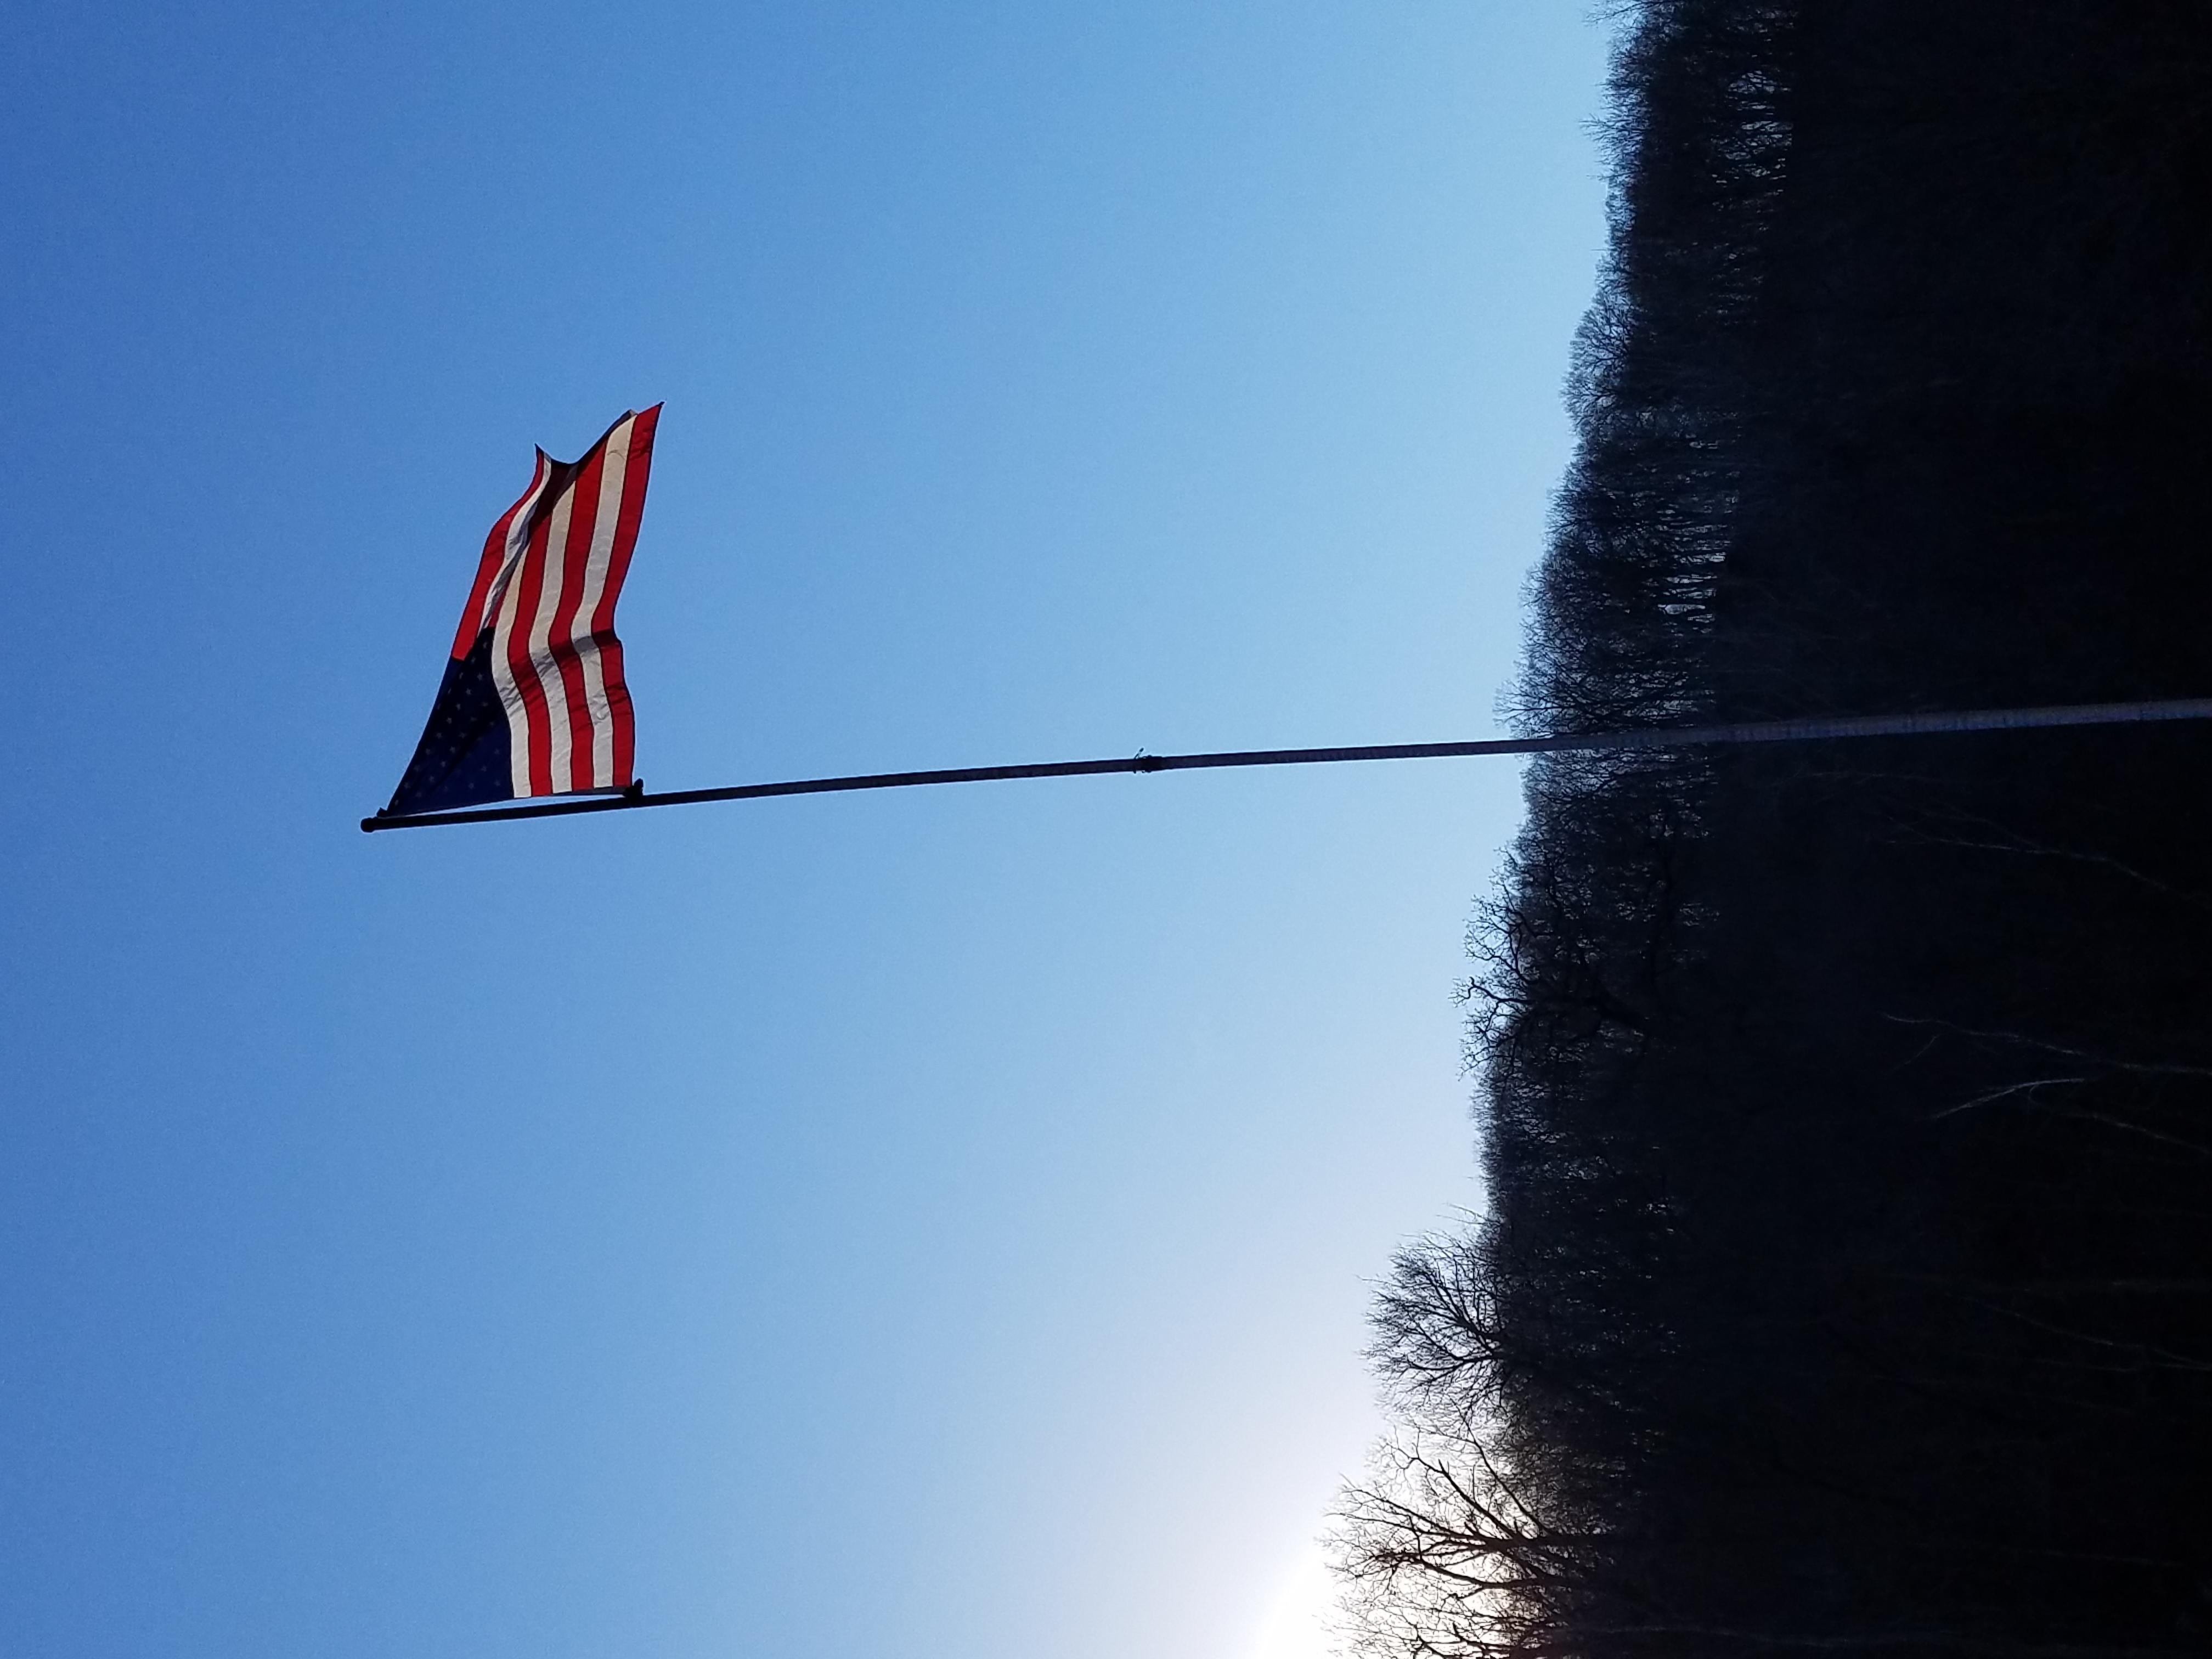 american-flag-pole-035.jpg